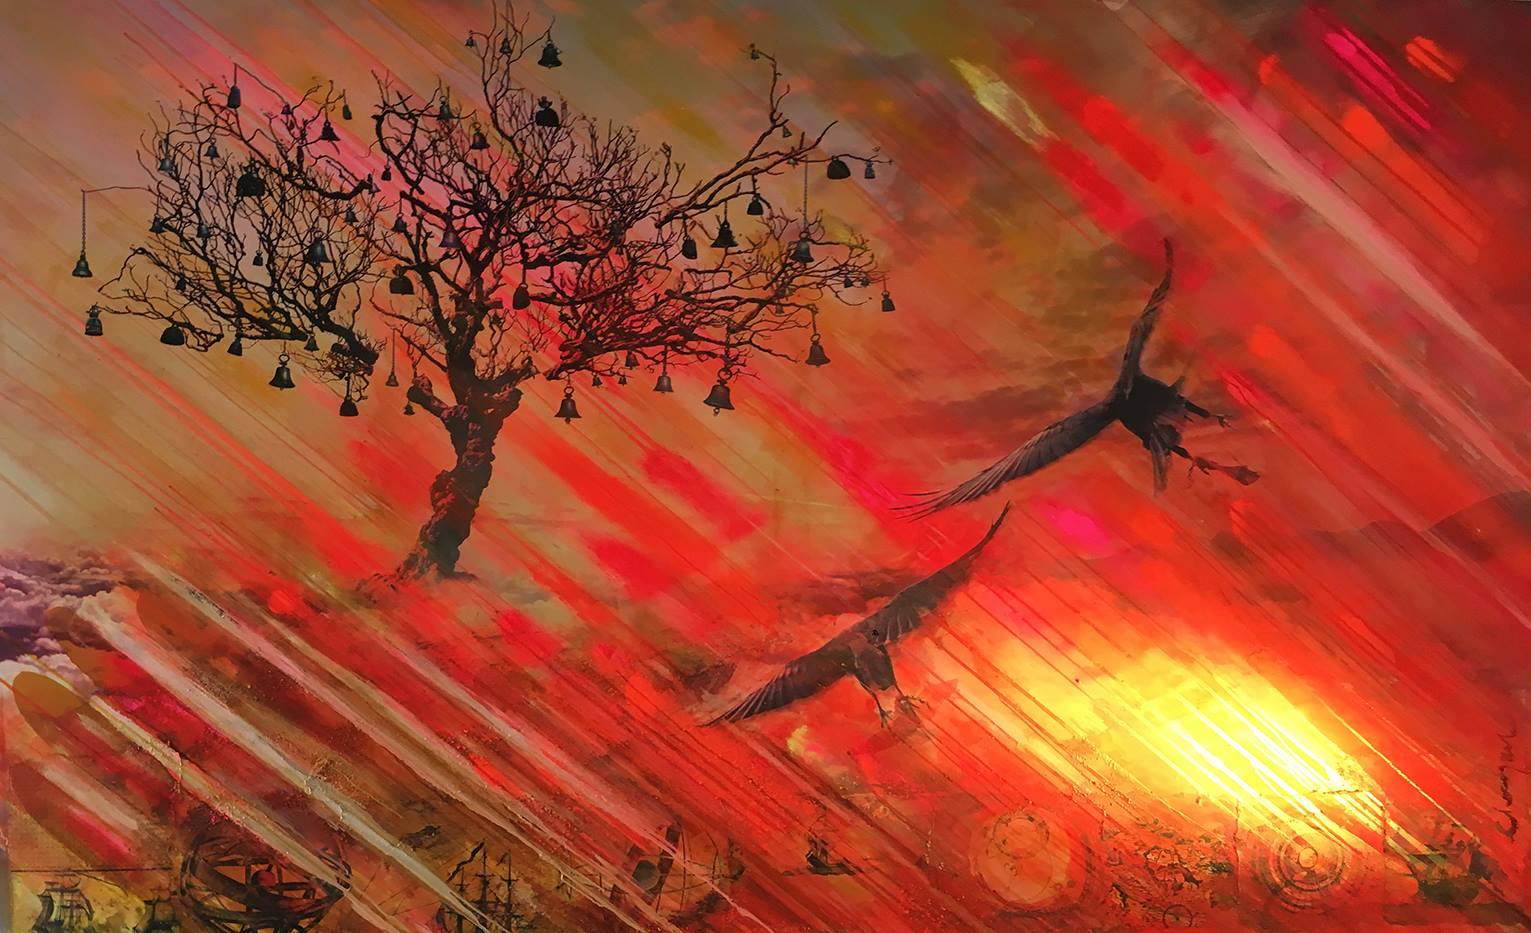 chayan khoi peintre artiste iranien tour de monde